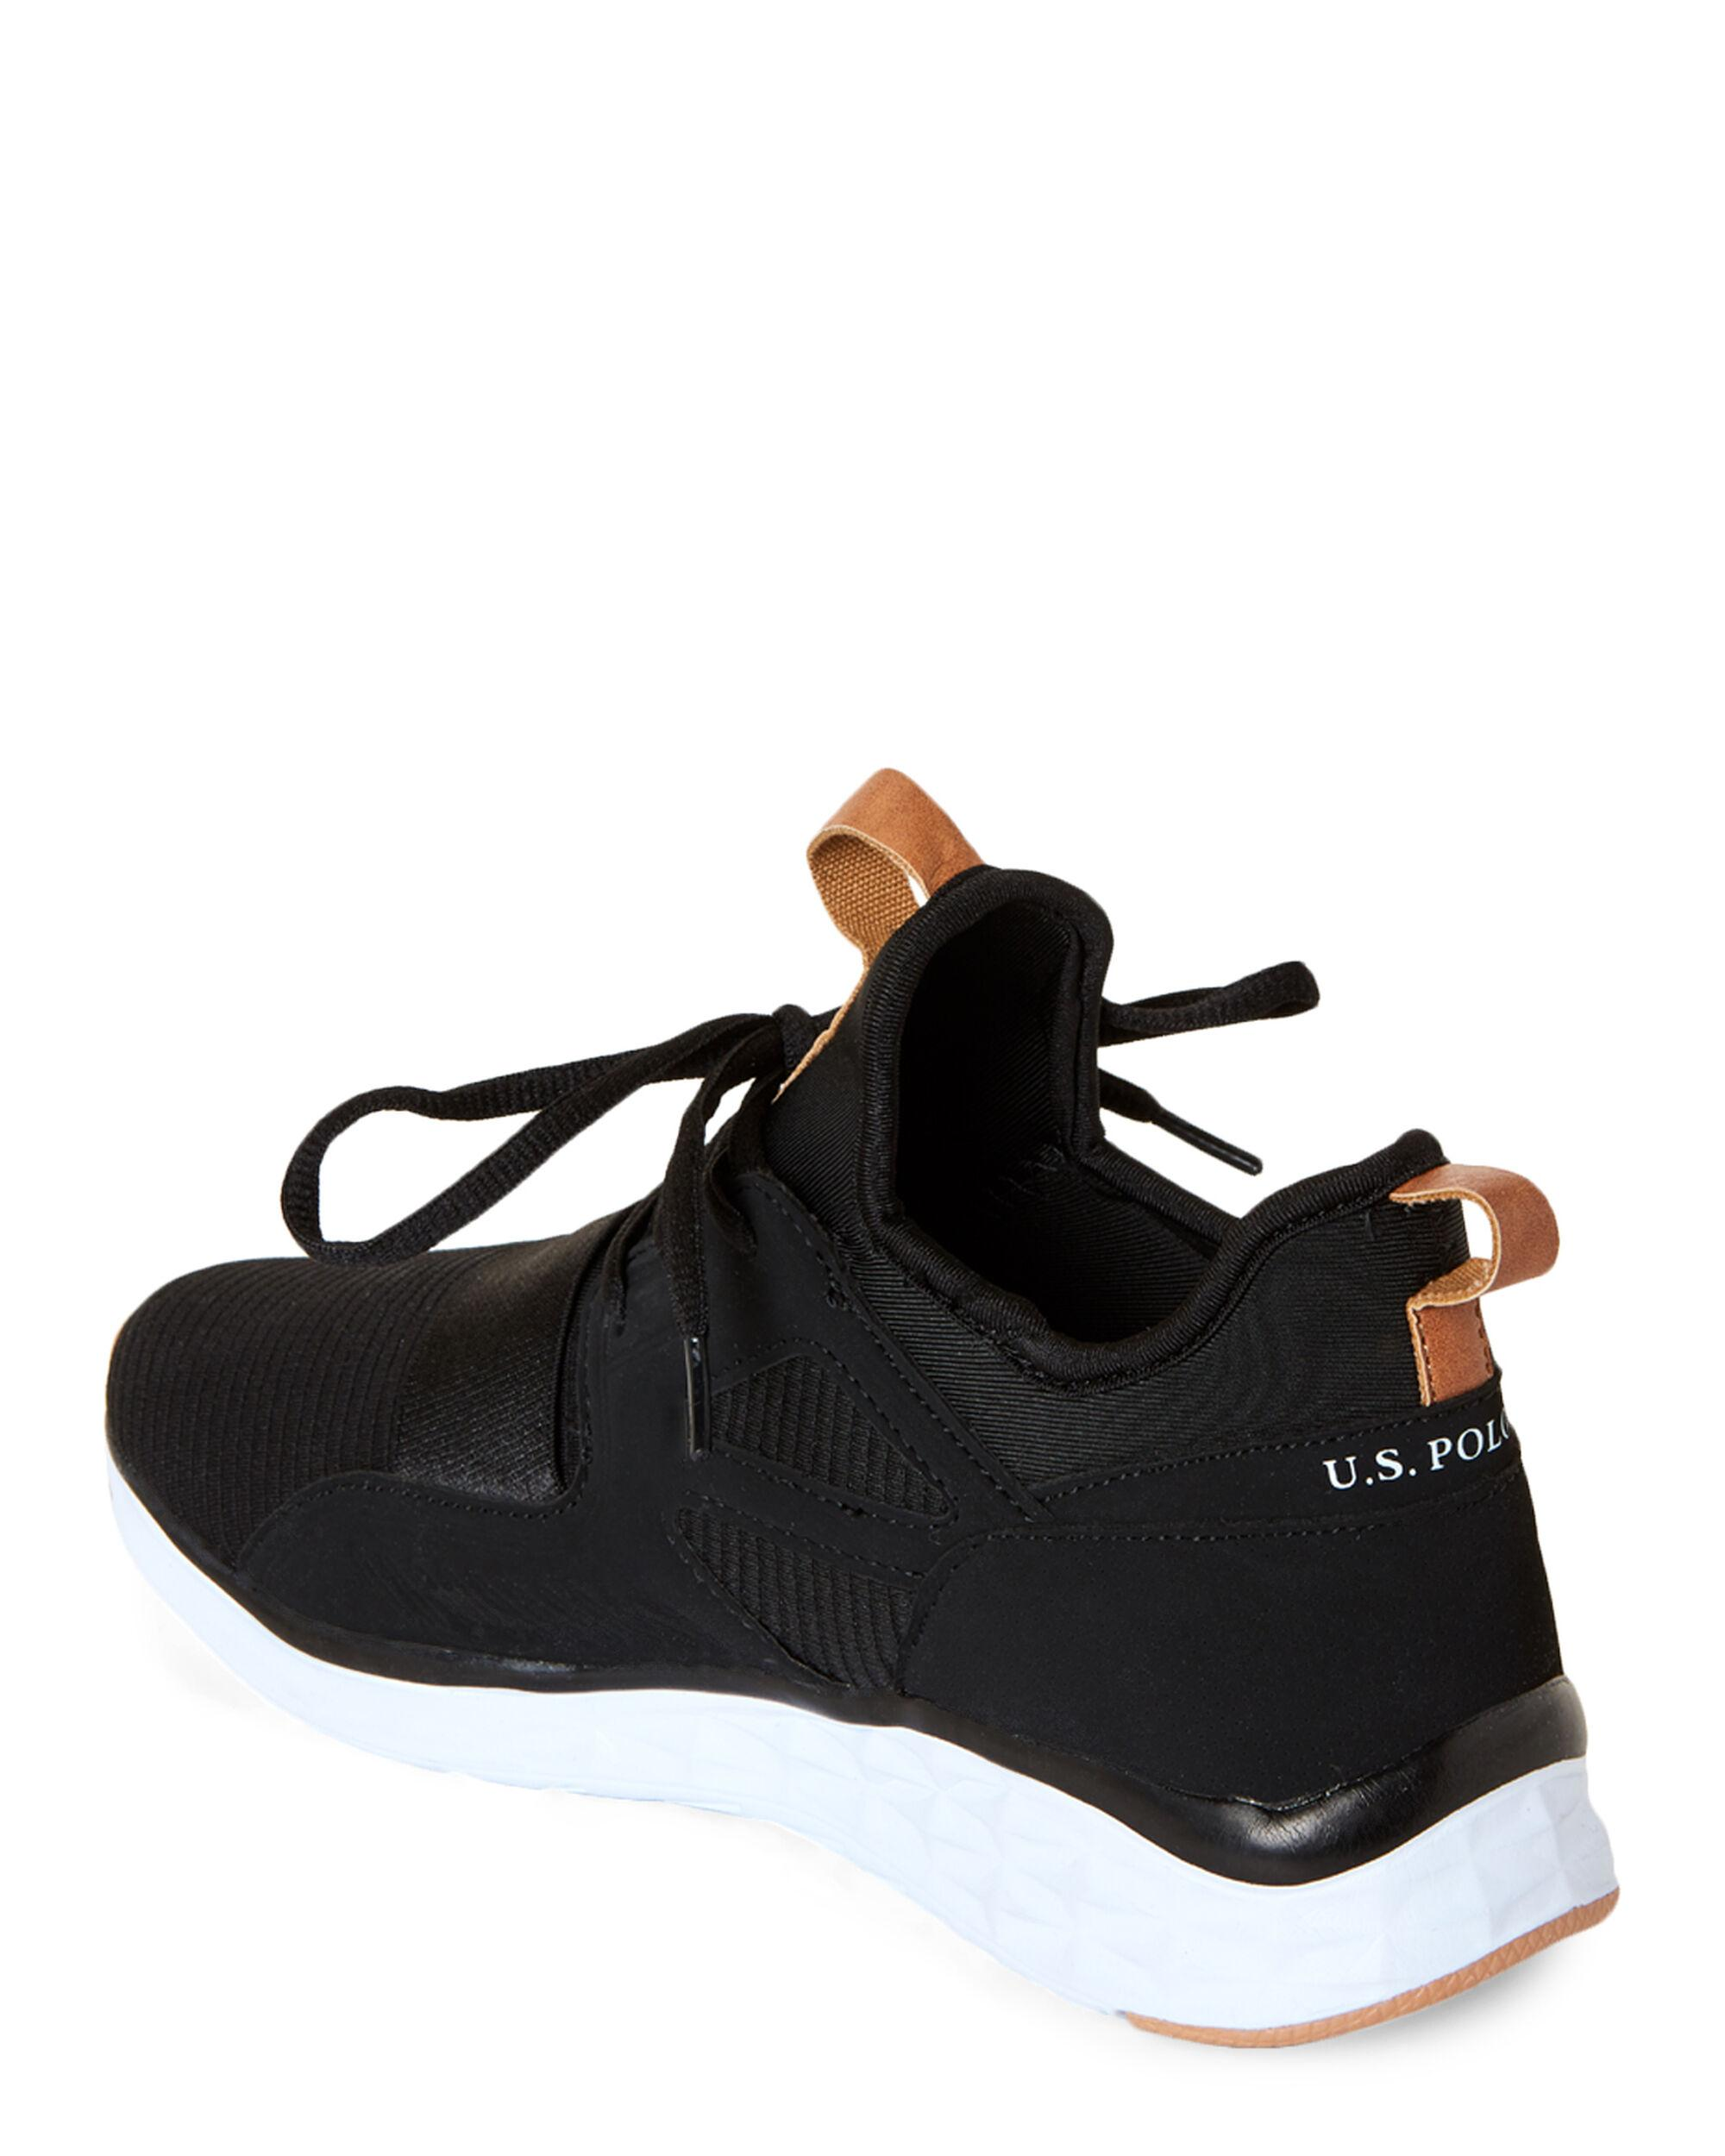 us polo assn shoes boots \u003e Up to 64